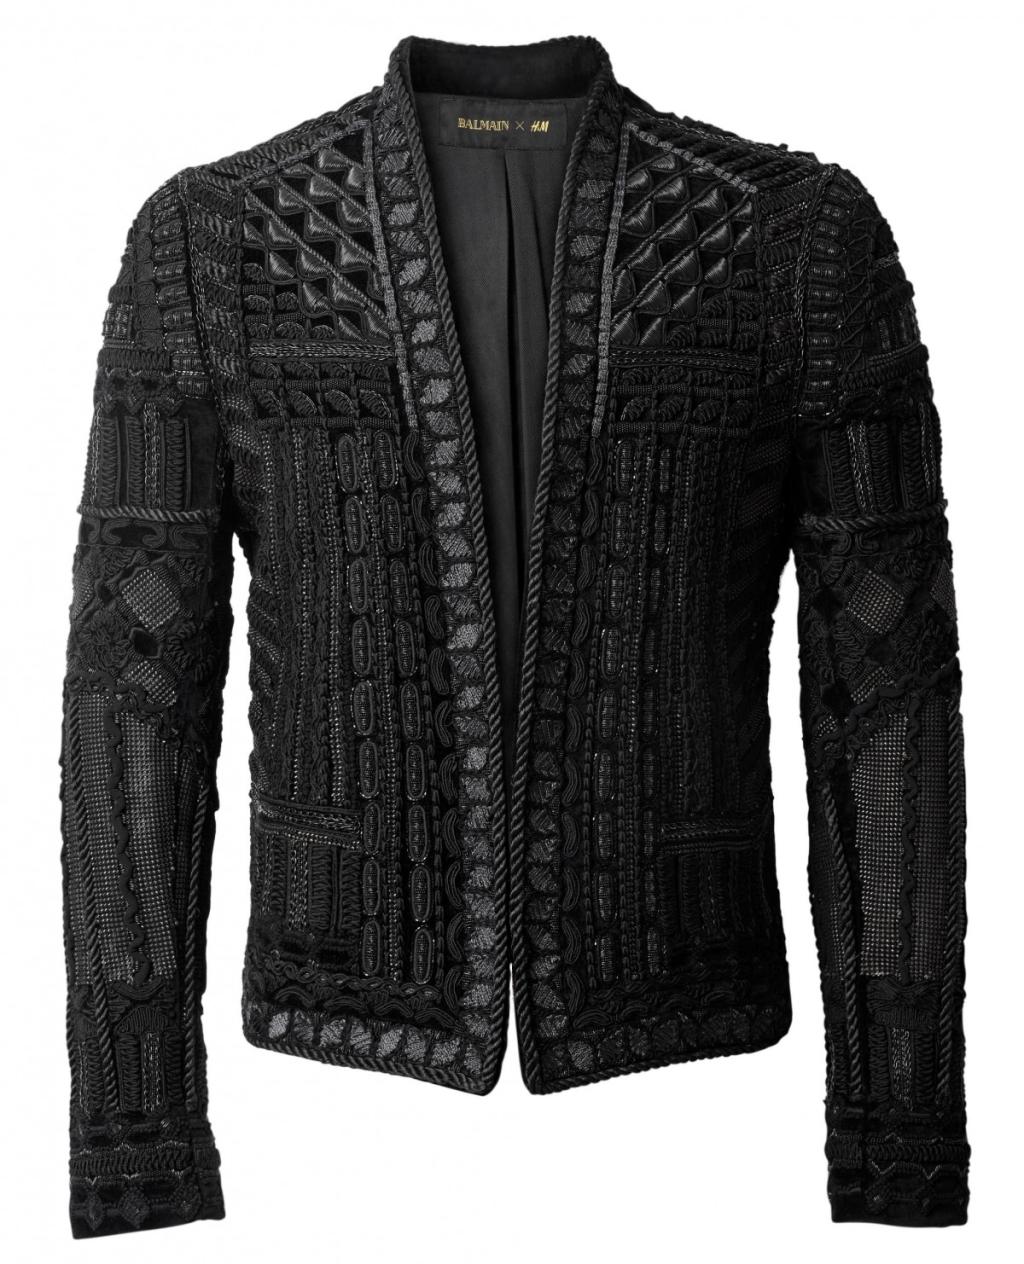 Balmain-x-HM-Velvet-Embroidered-Jacket-Men-1200x1482